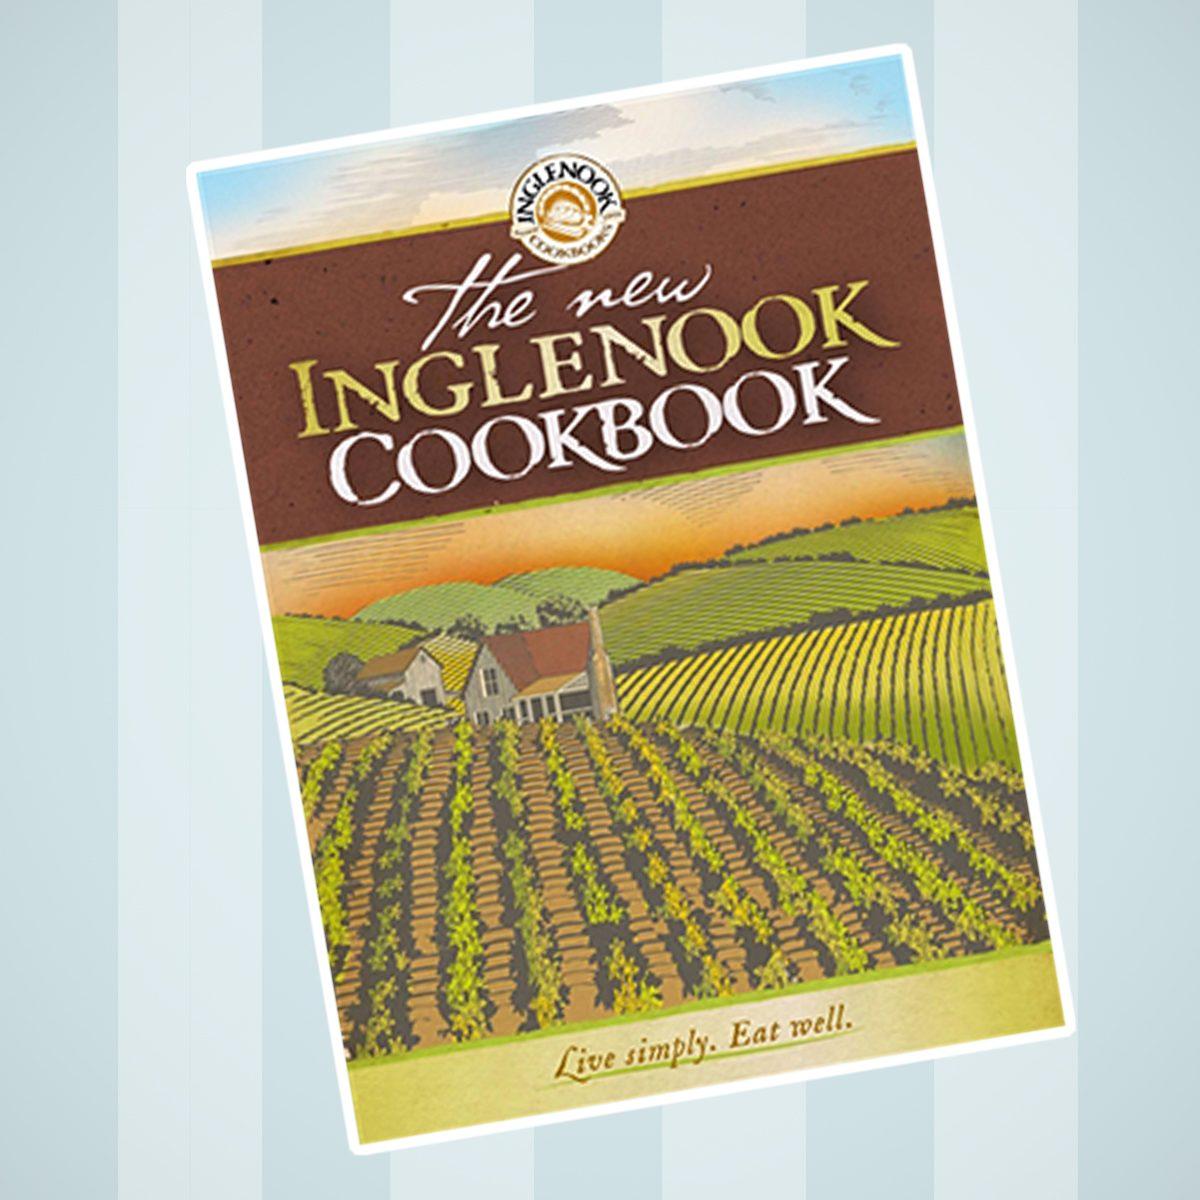 The New Inglenook Cookbook